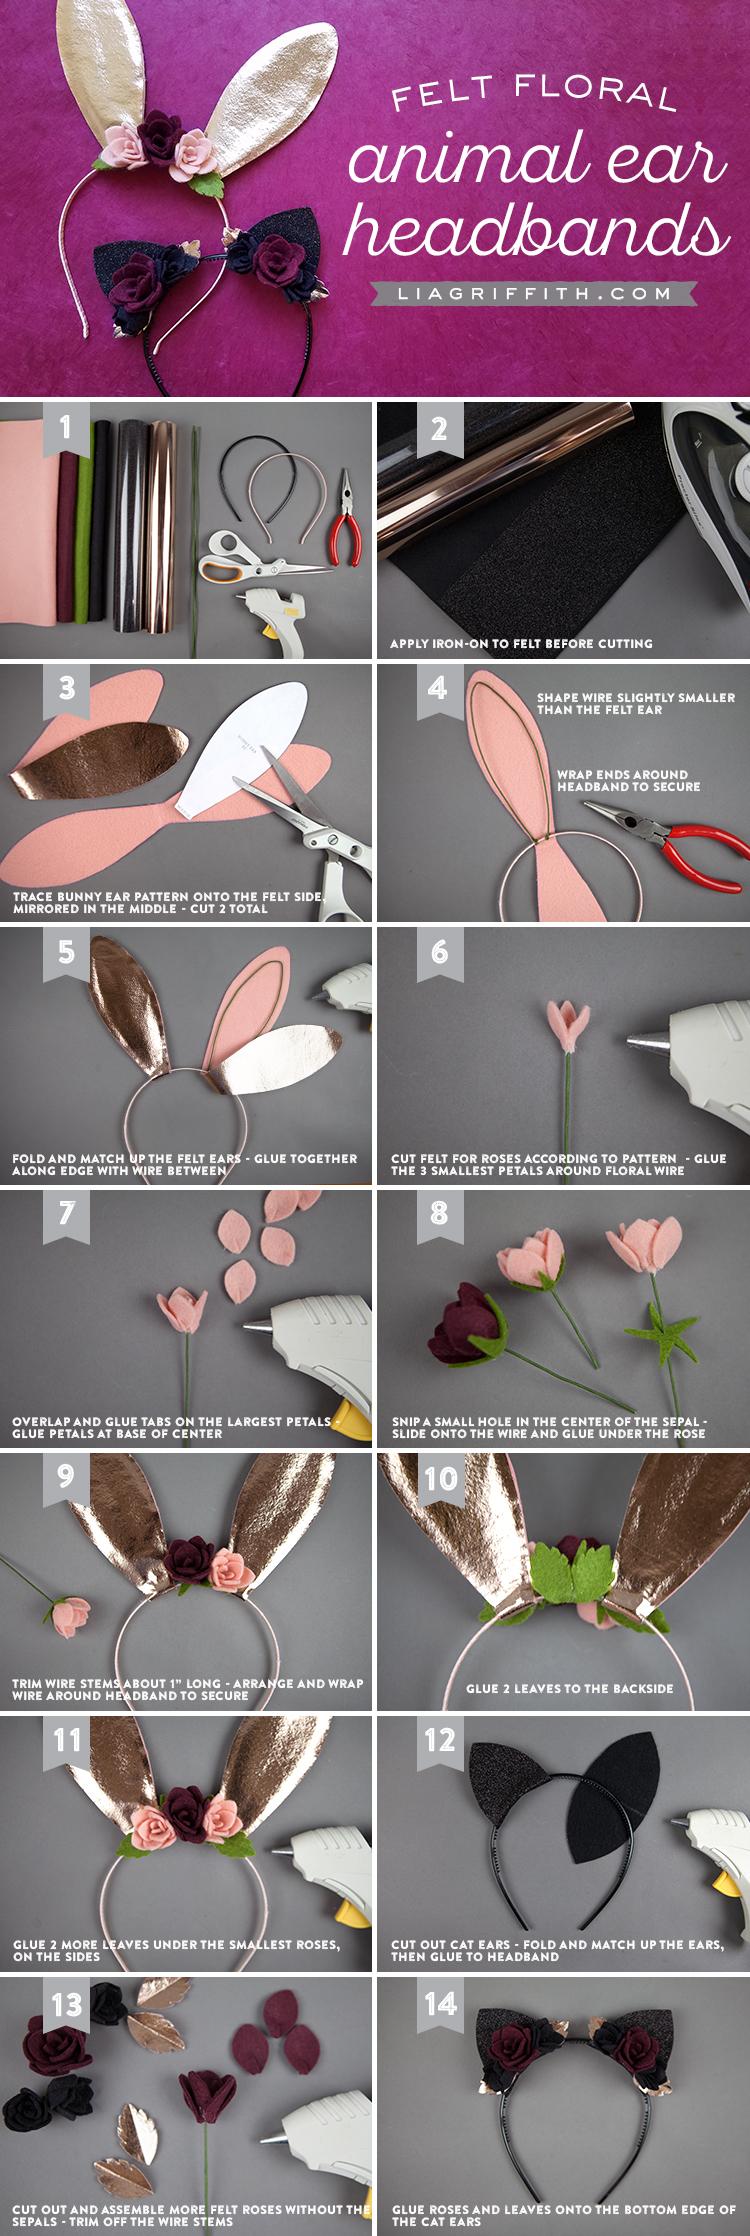 DIY cat and bunny ears for Halloween headbands by Lia Griffith